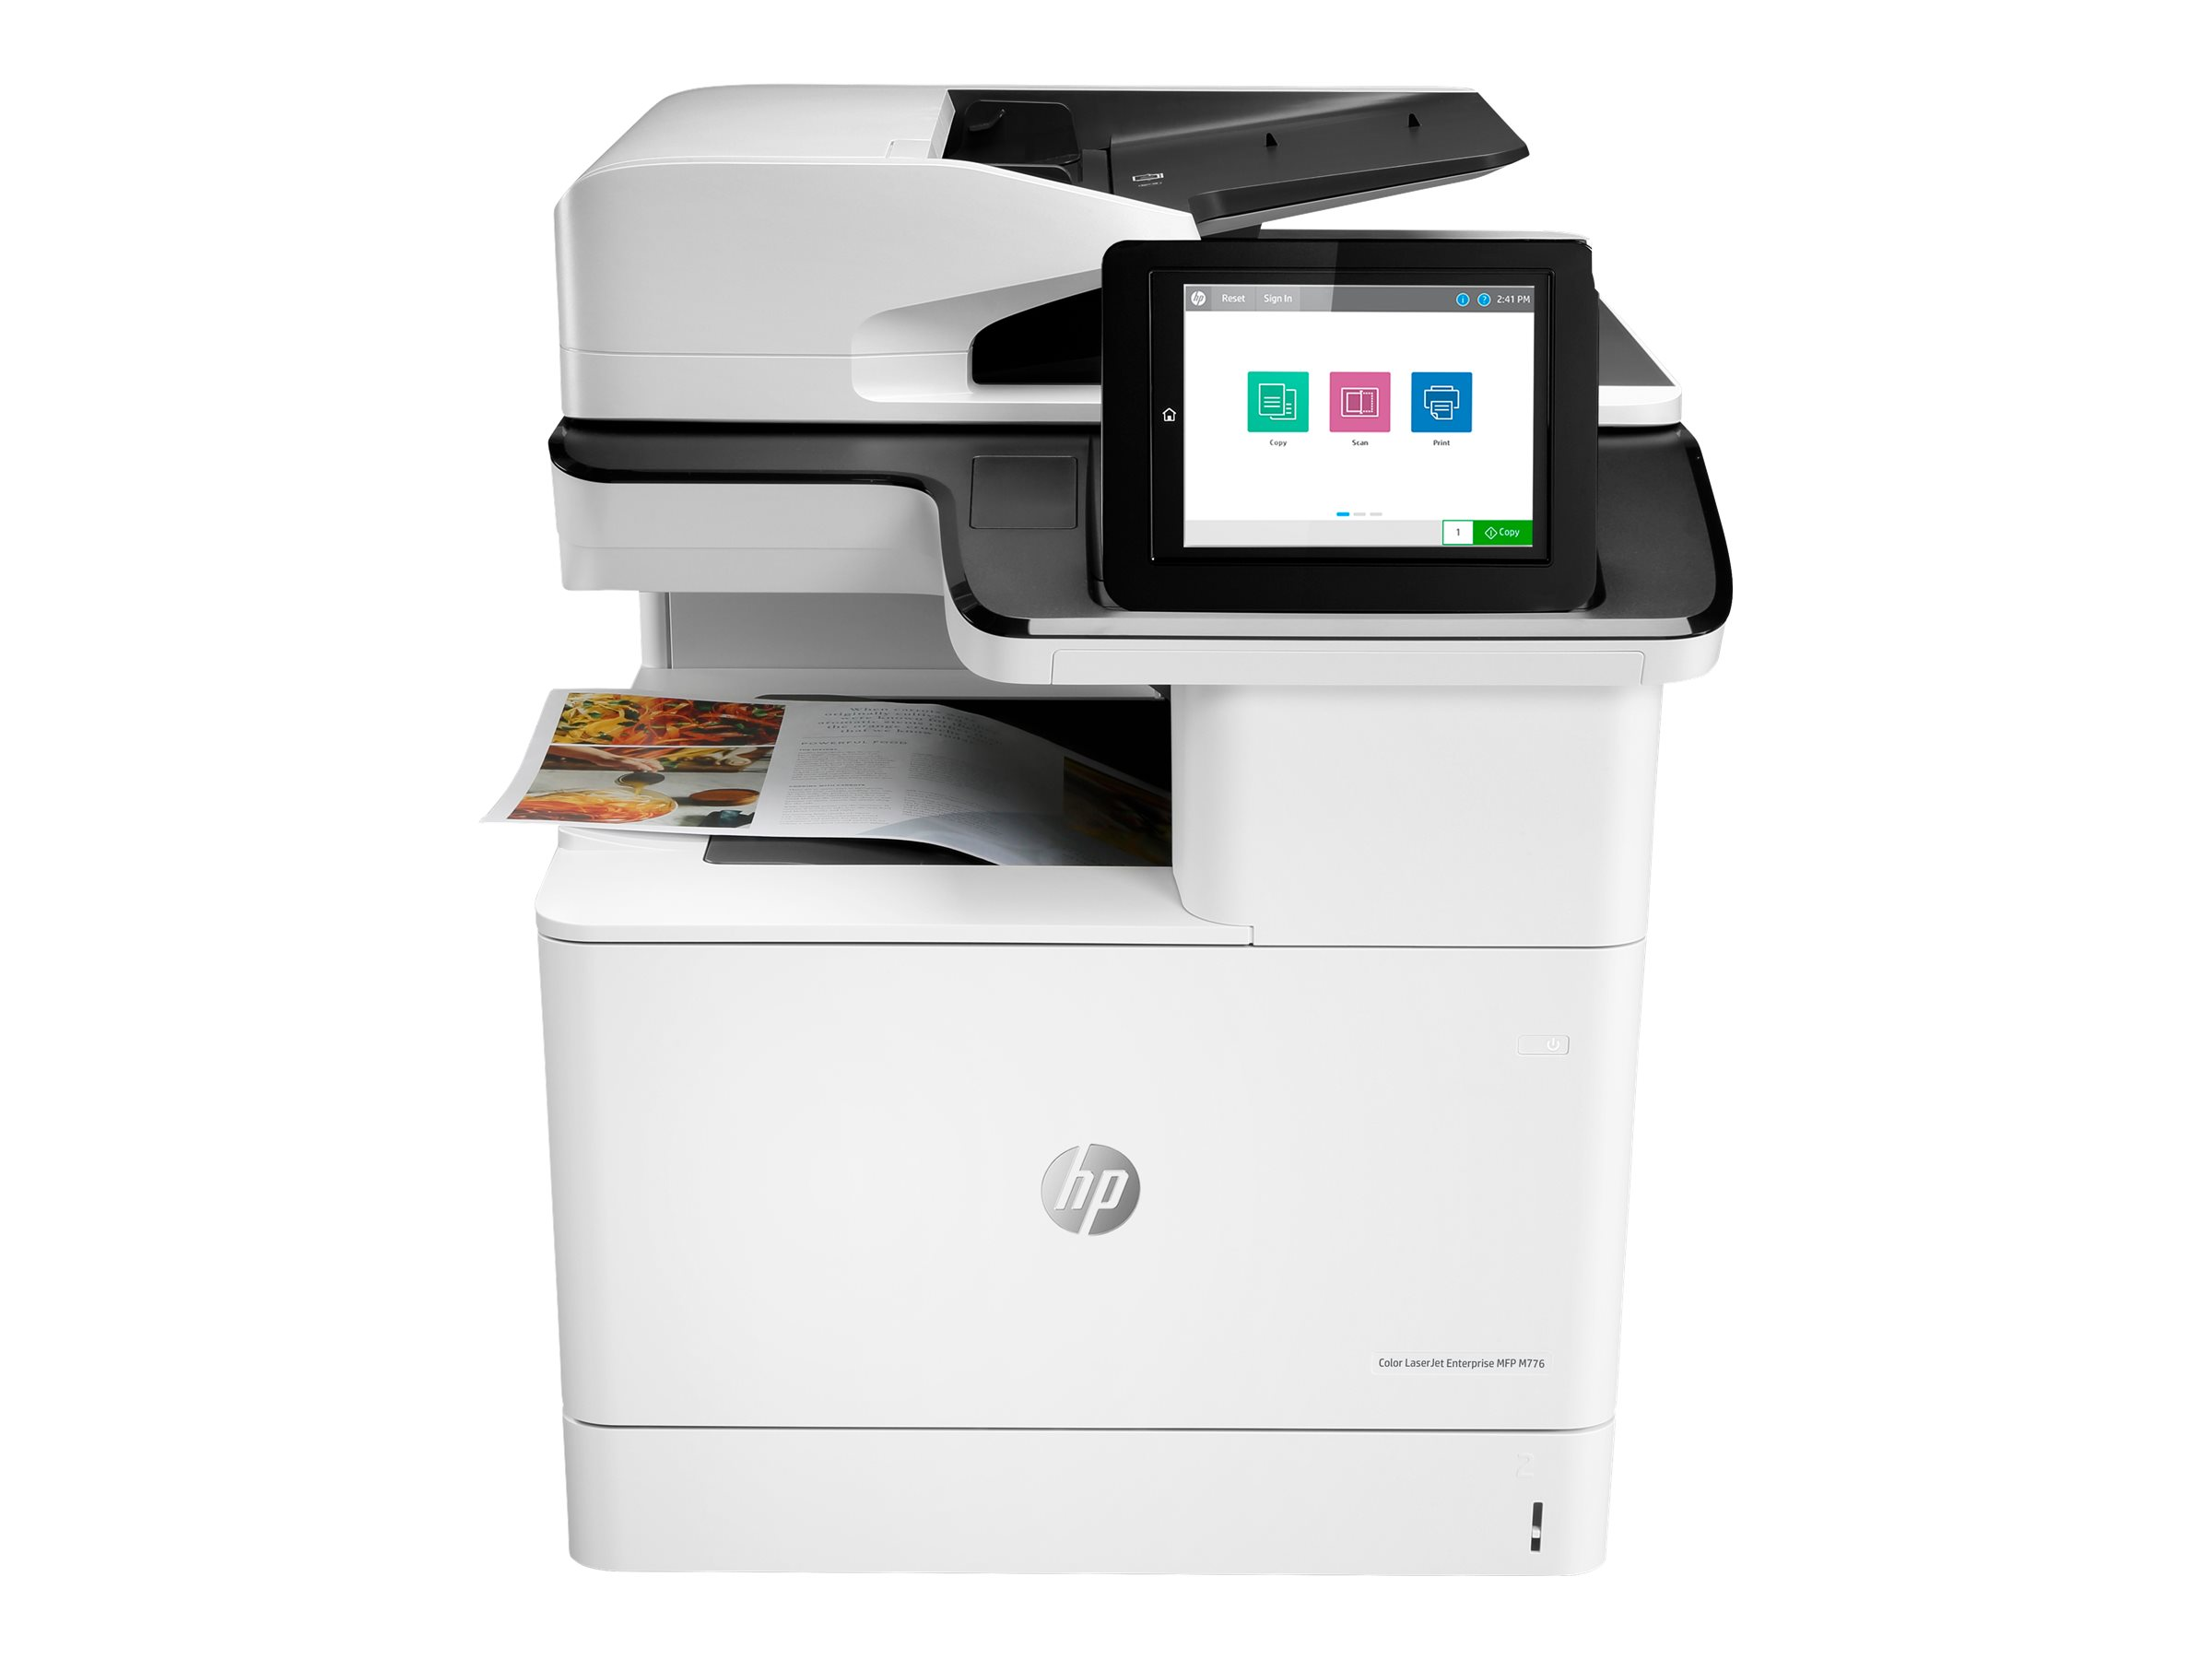 HP LaserJet Enterprise MFP M776dn - Multifunktionsdrucker - Farbe - Laser - 297 x 864 mm (Original)